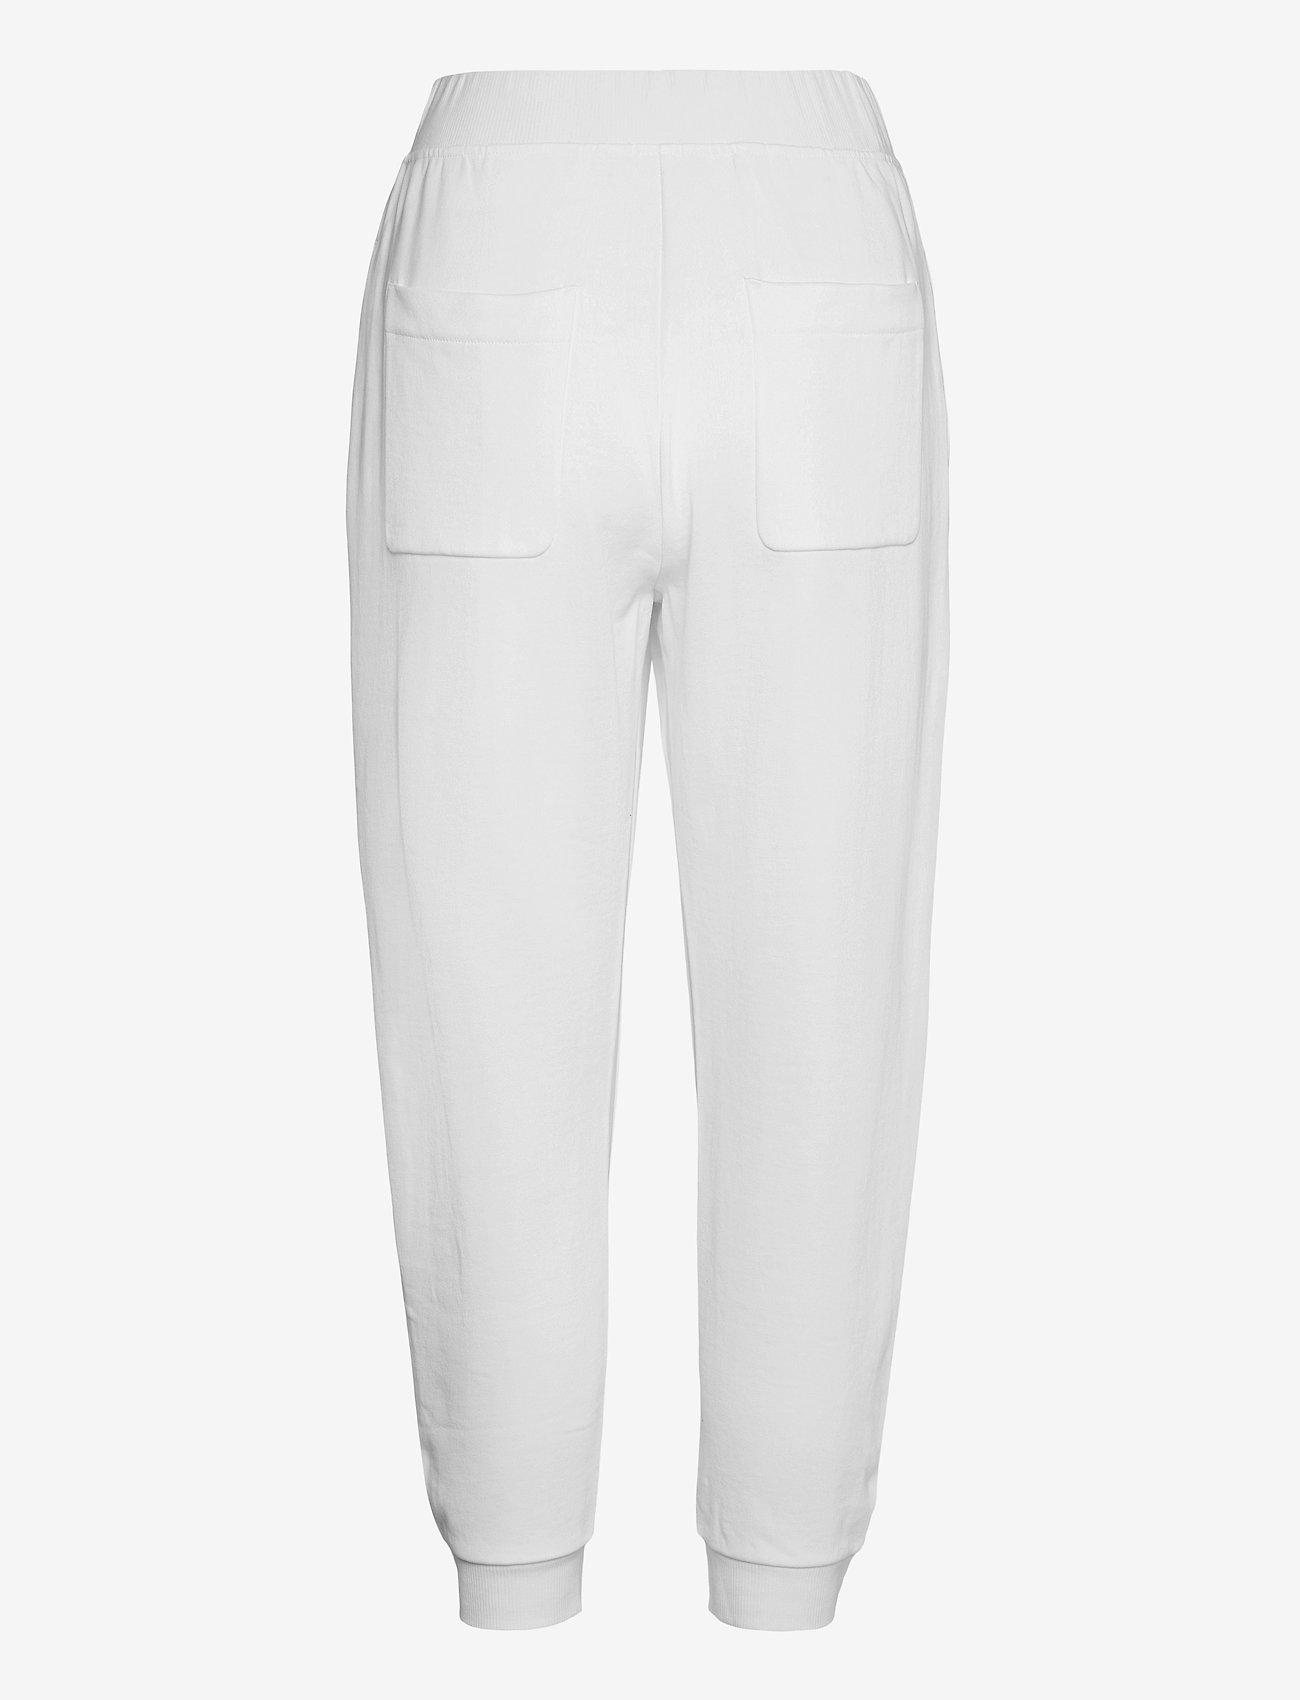 Max Mara Leisure - BRIC - casual trousers - optical white - 1